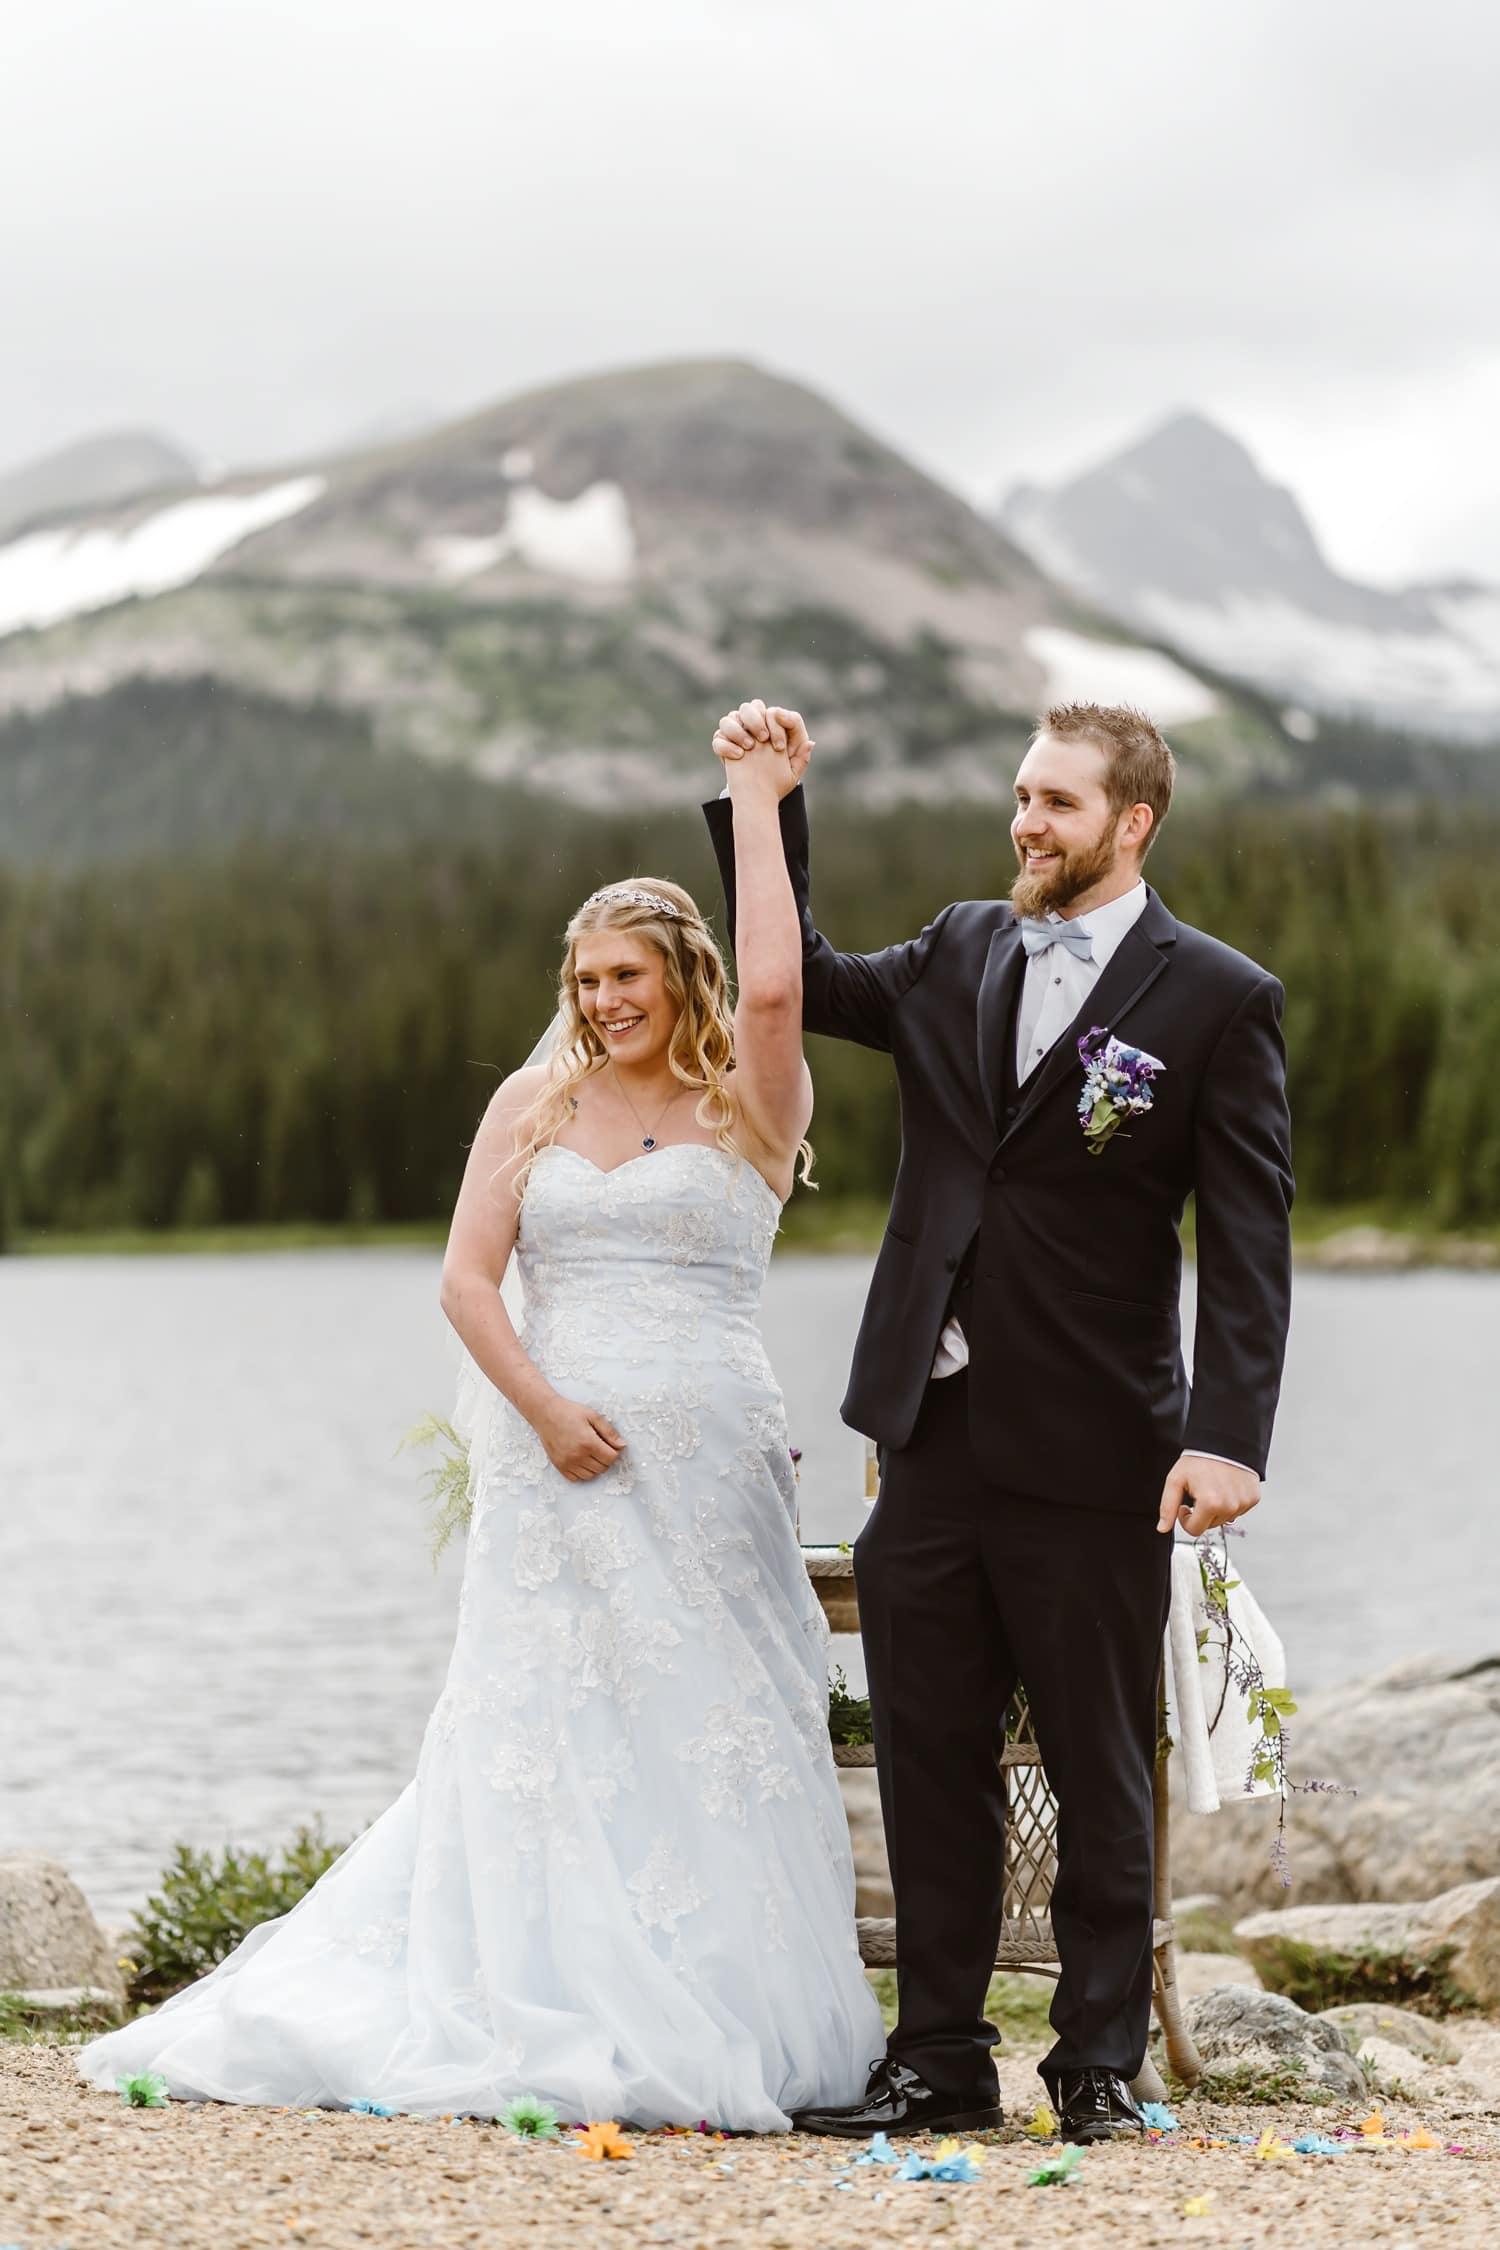 Bride and Groom at Vow Ceremony at Colorado Adventure Elopement